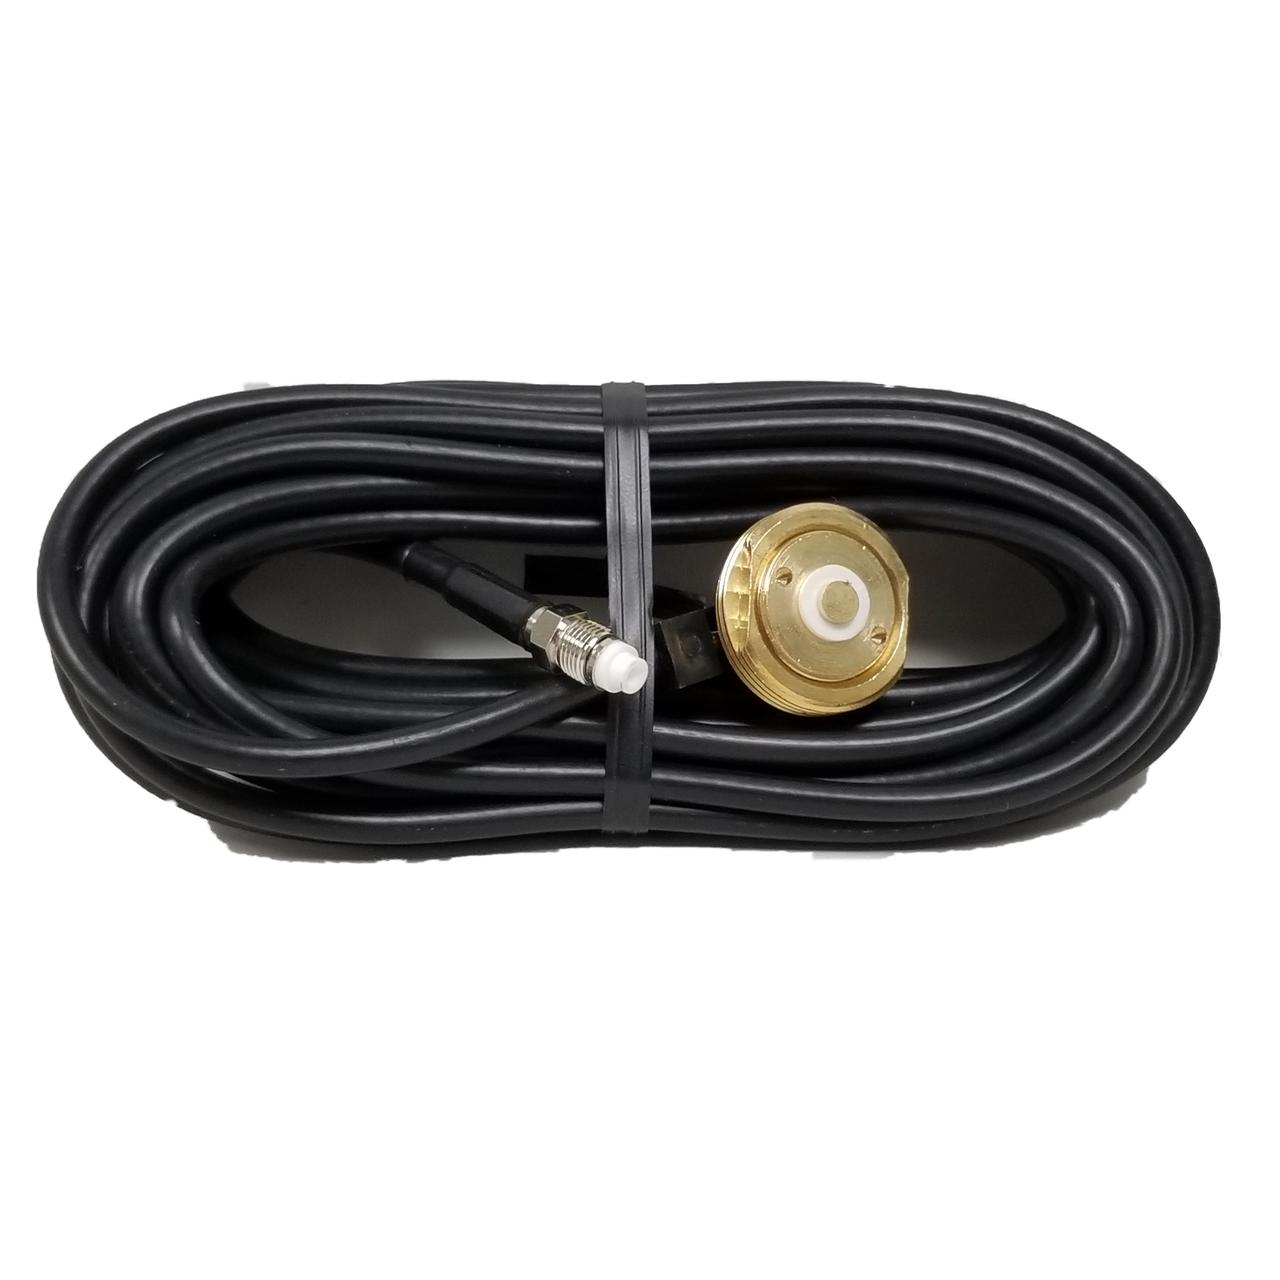 NMO-3417 - NMO Antenna Cable Mount - 17-Foot RG-58 - TNC